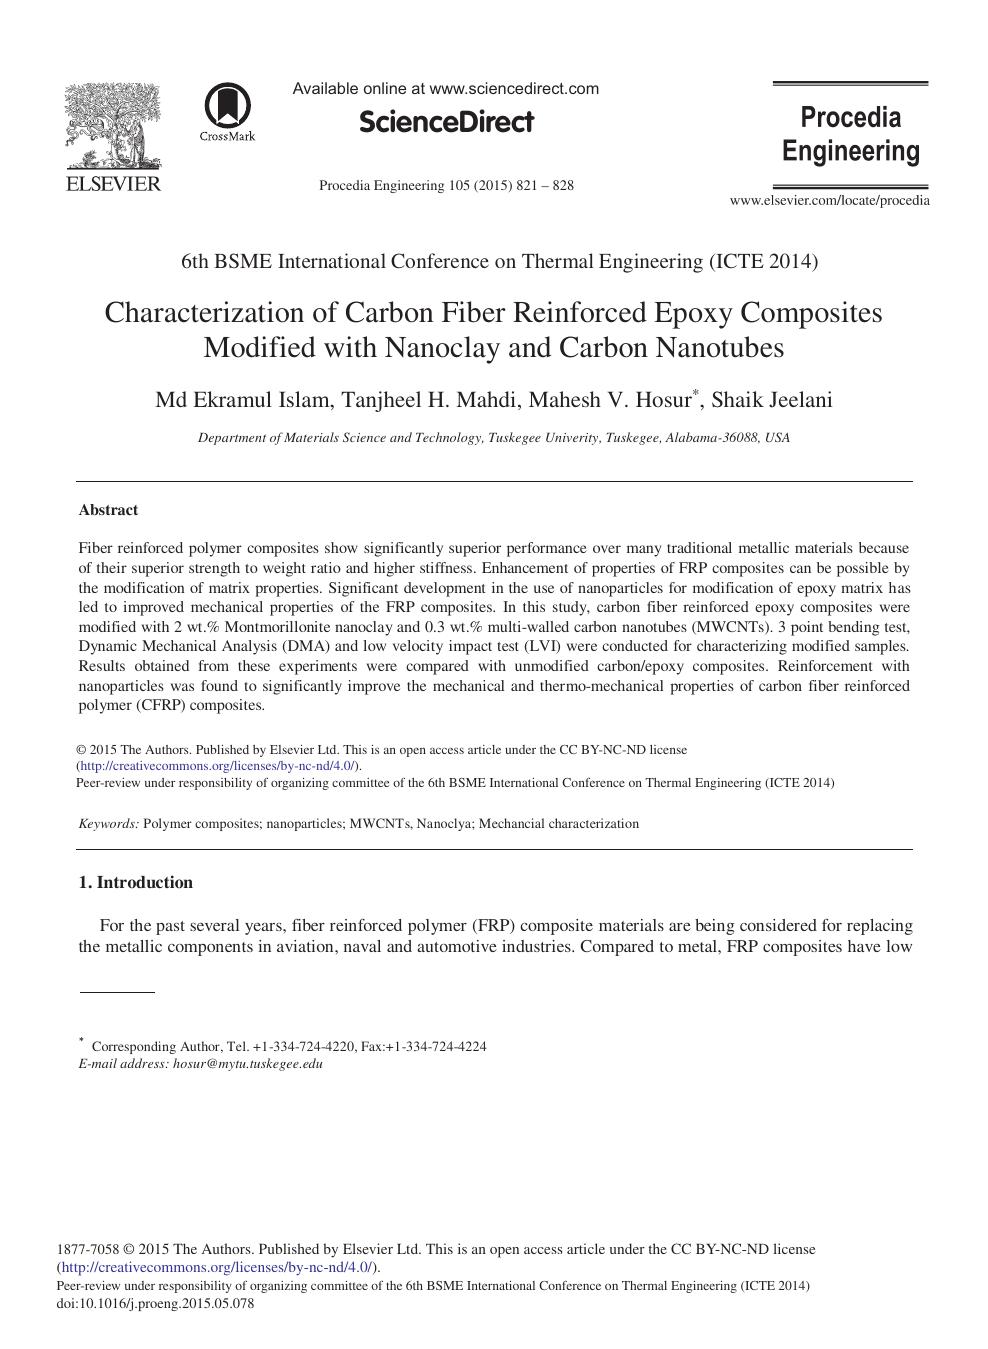 Characterization of Carbon Fiber Reinforced Epoxy Composites